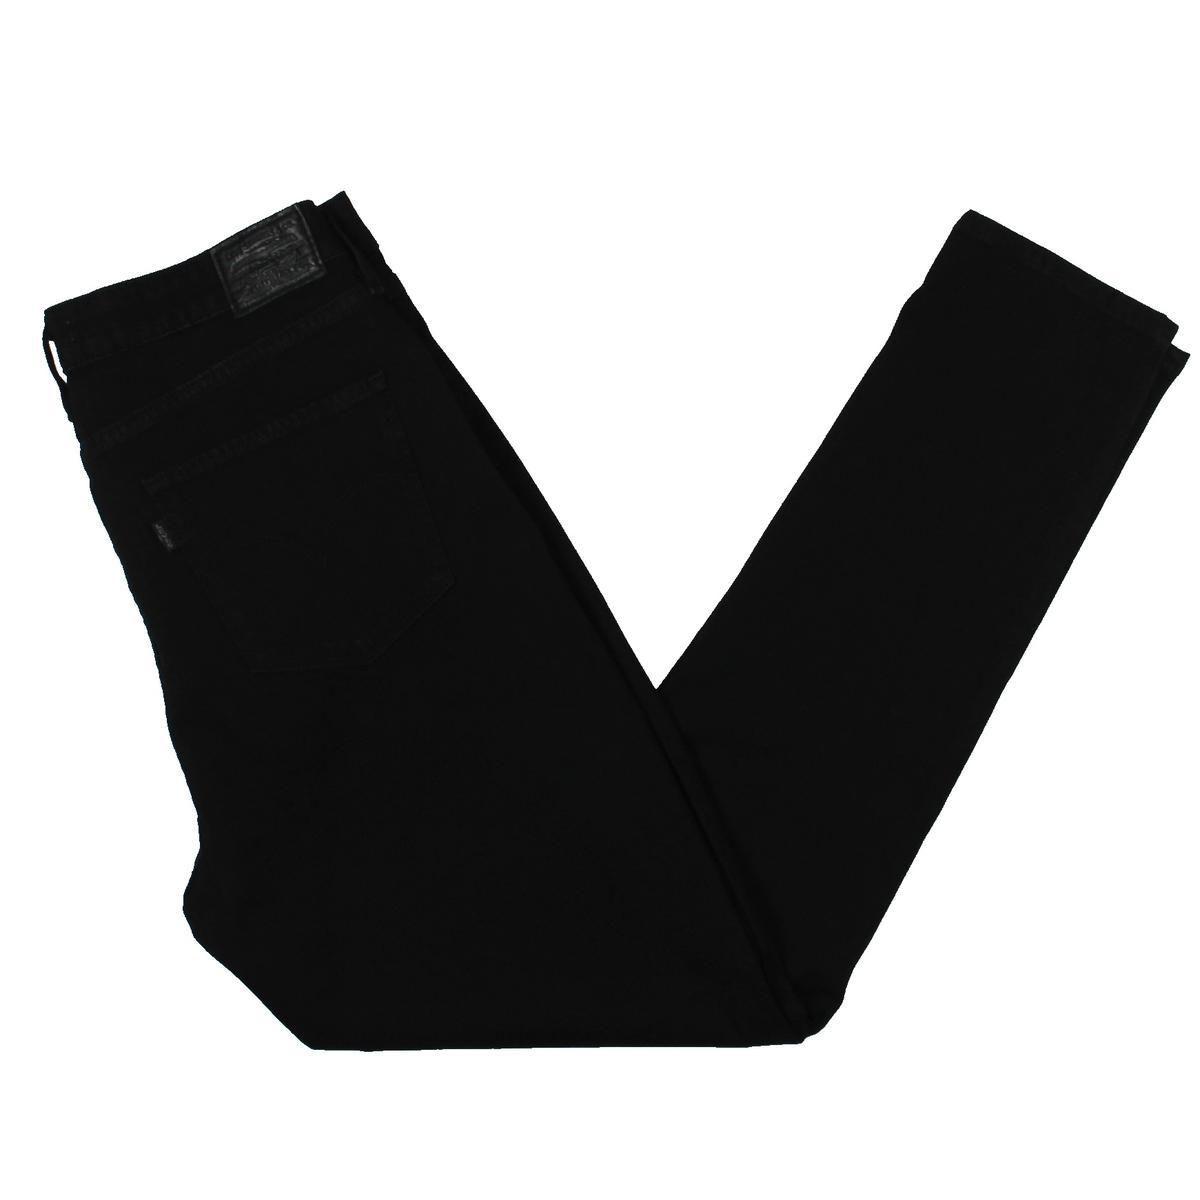 Levi's Womens Slim, Skinny Black Size 33/30